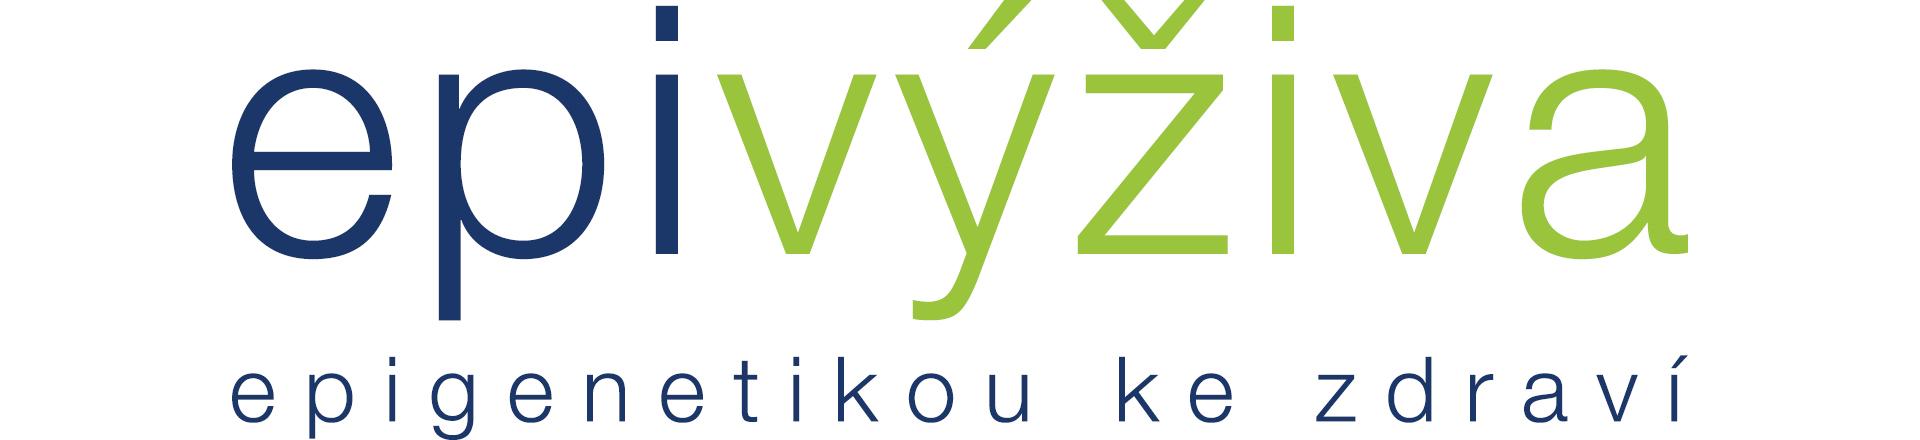 EpiVýživa.cz